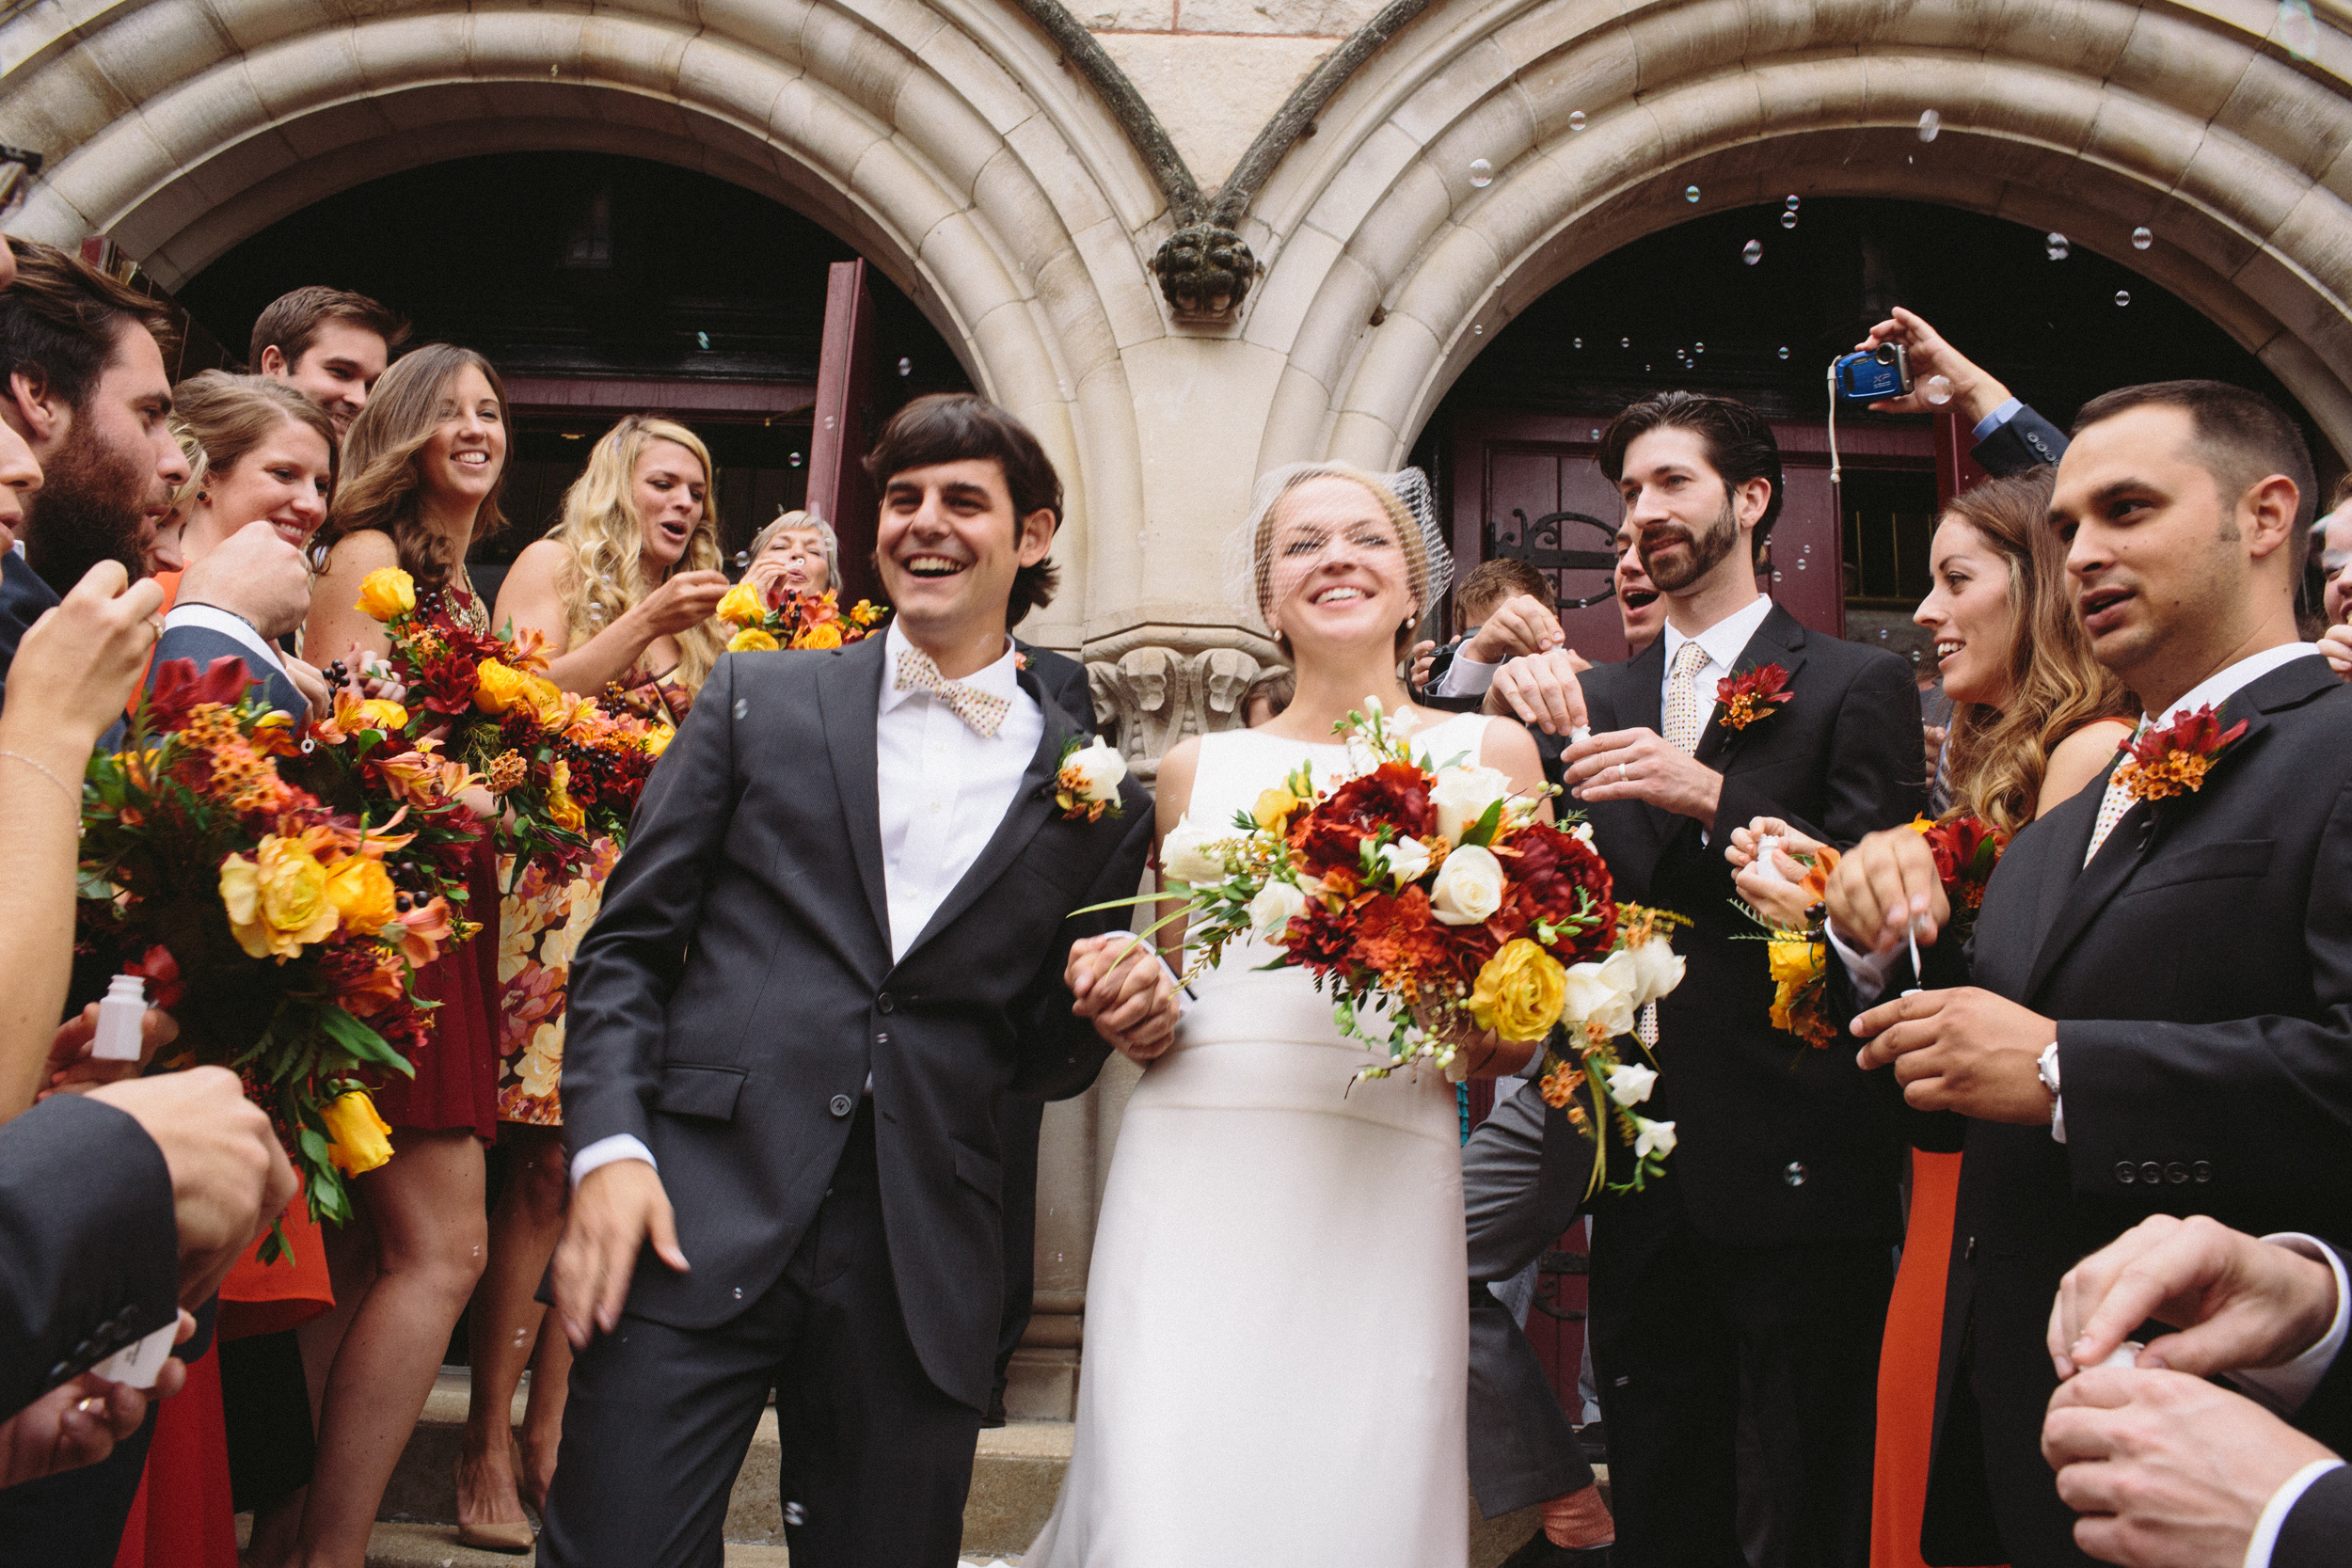 10-05-2013 maggie & adam wedding photography by brian milo-141.jpg